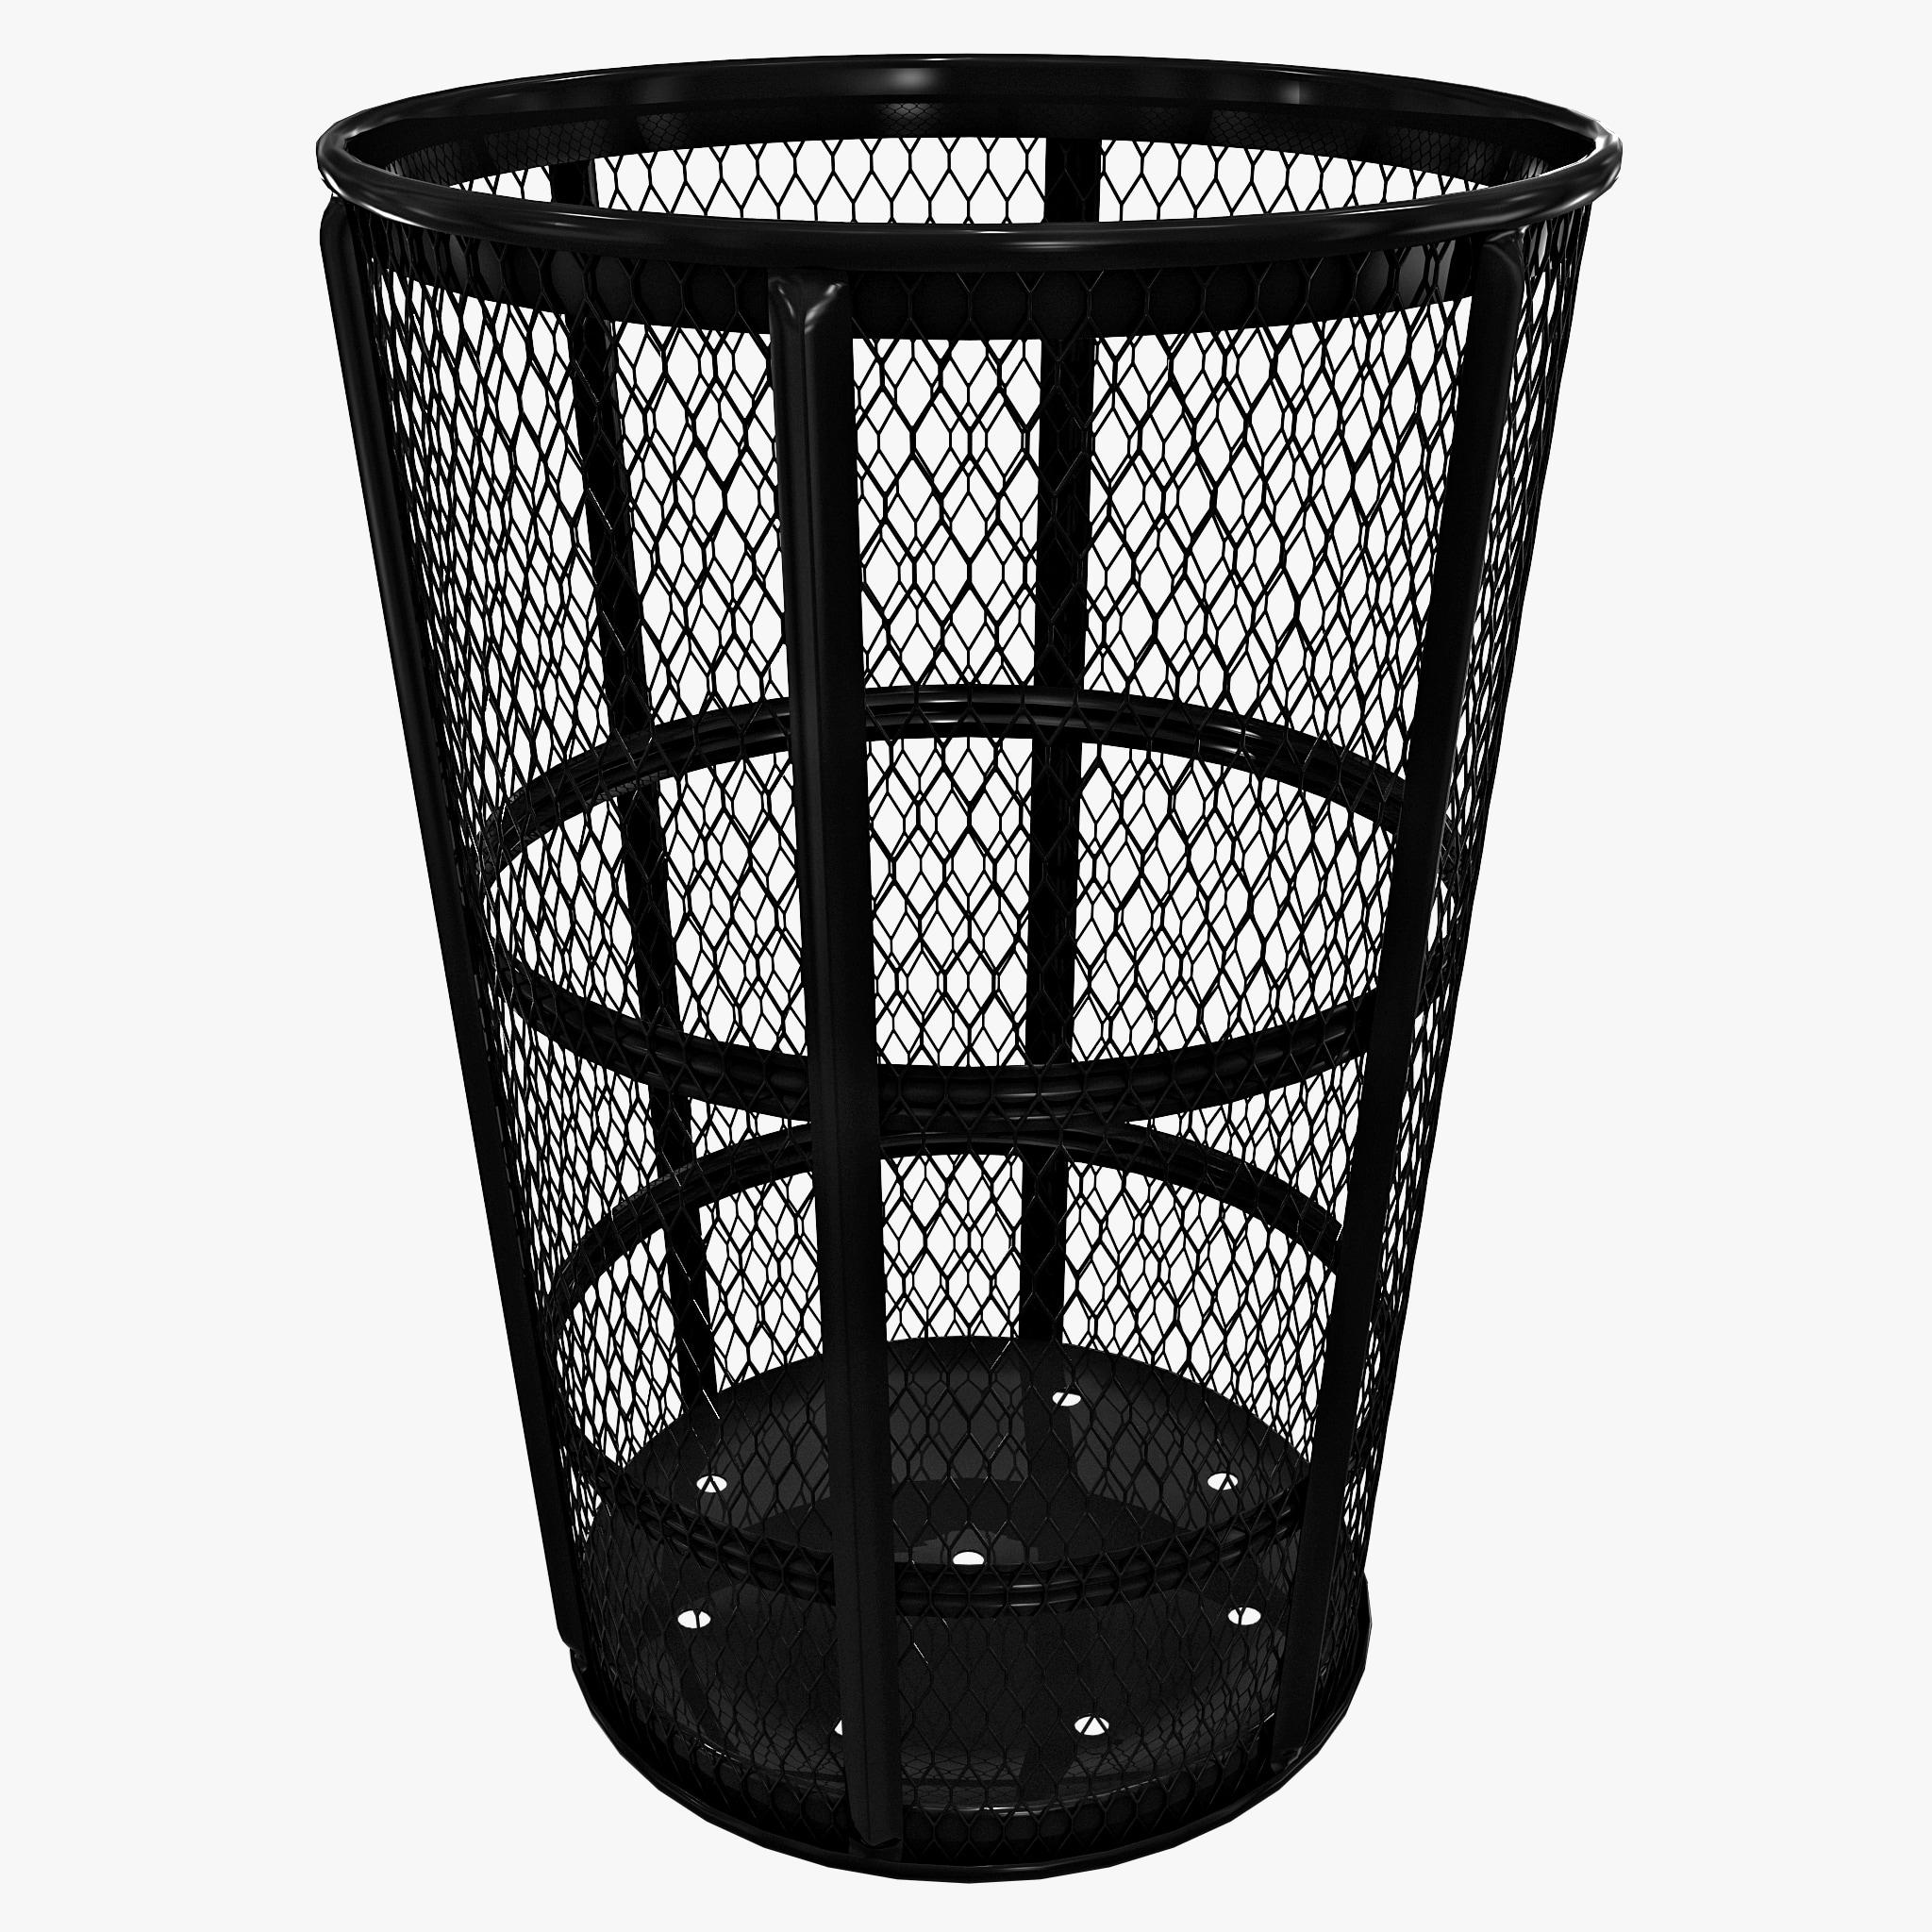 3ds street basket waste receptacle